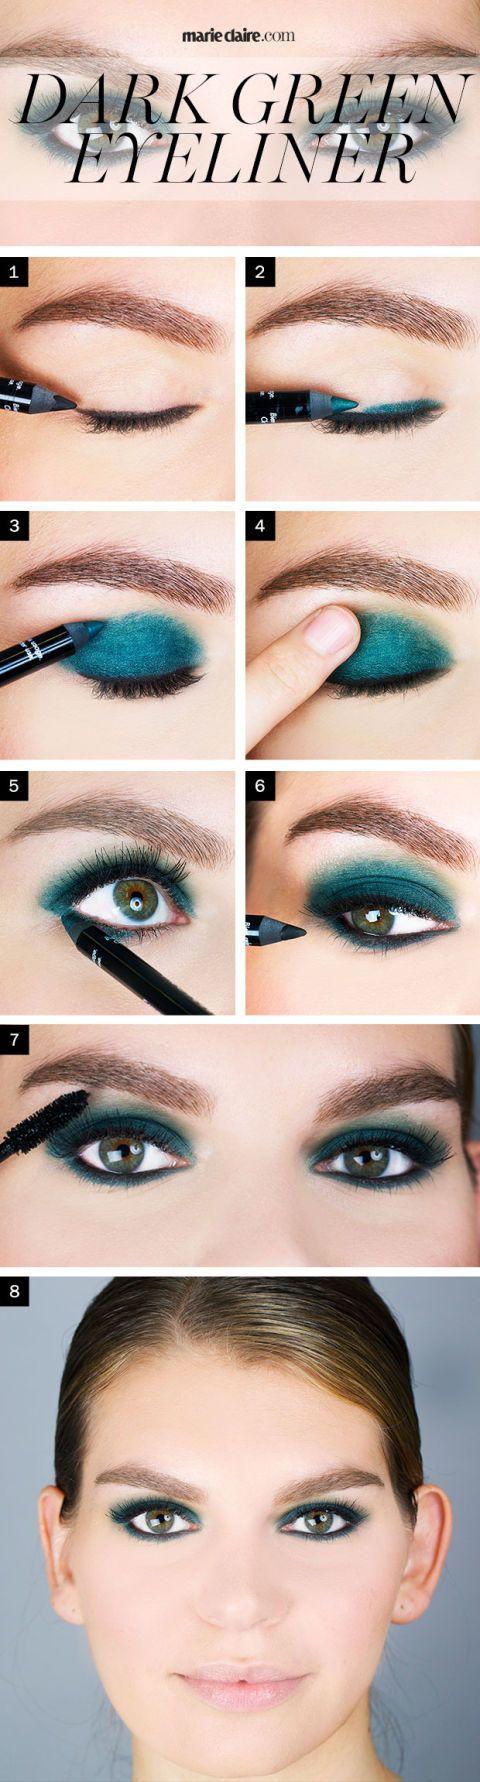 dark green eyeliner how to